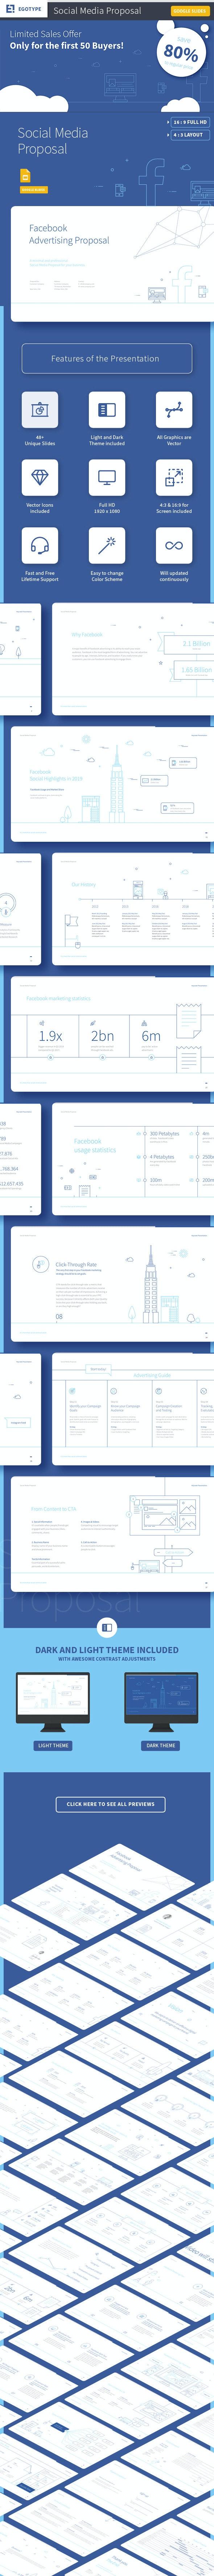 Social Media Presentation Template - Google Slides Presentation Templates